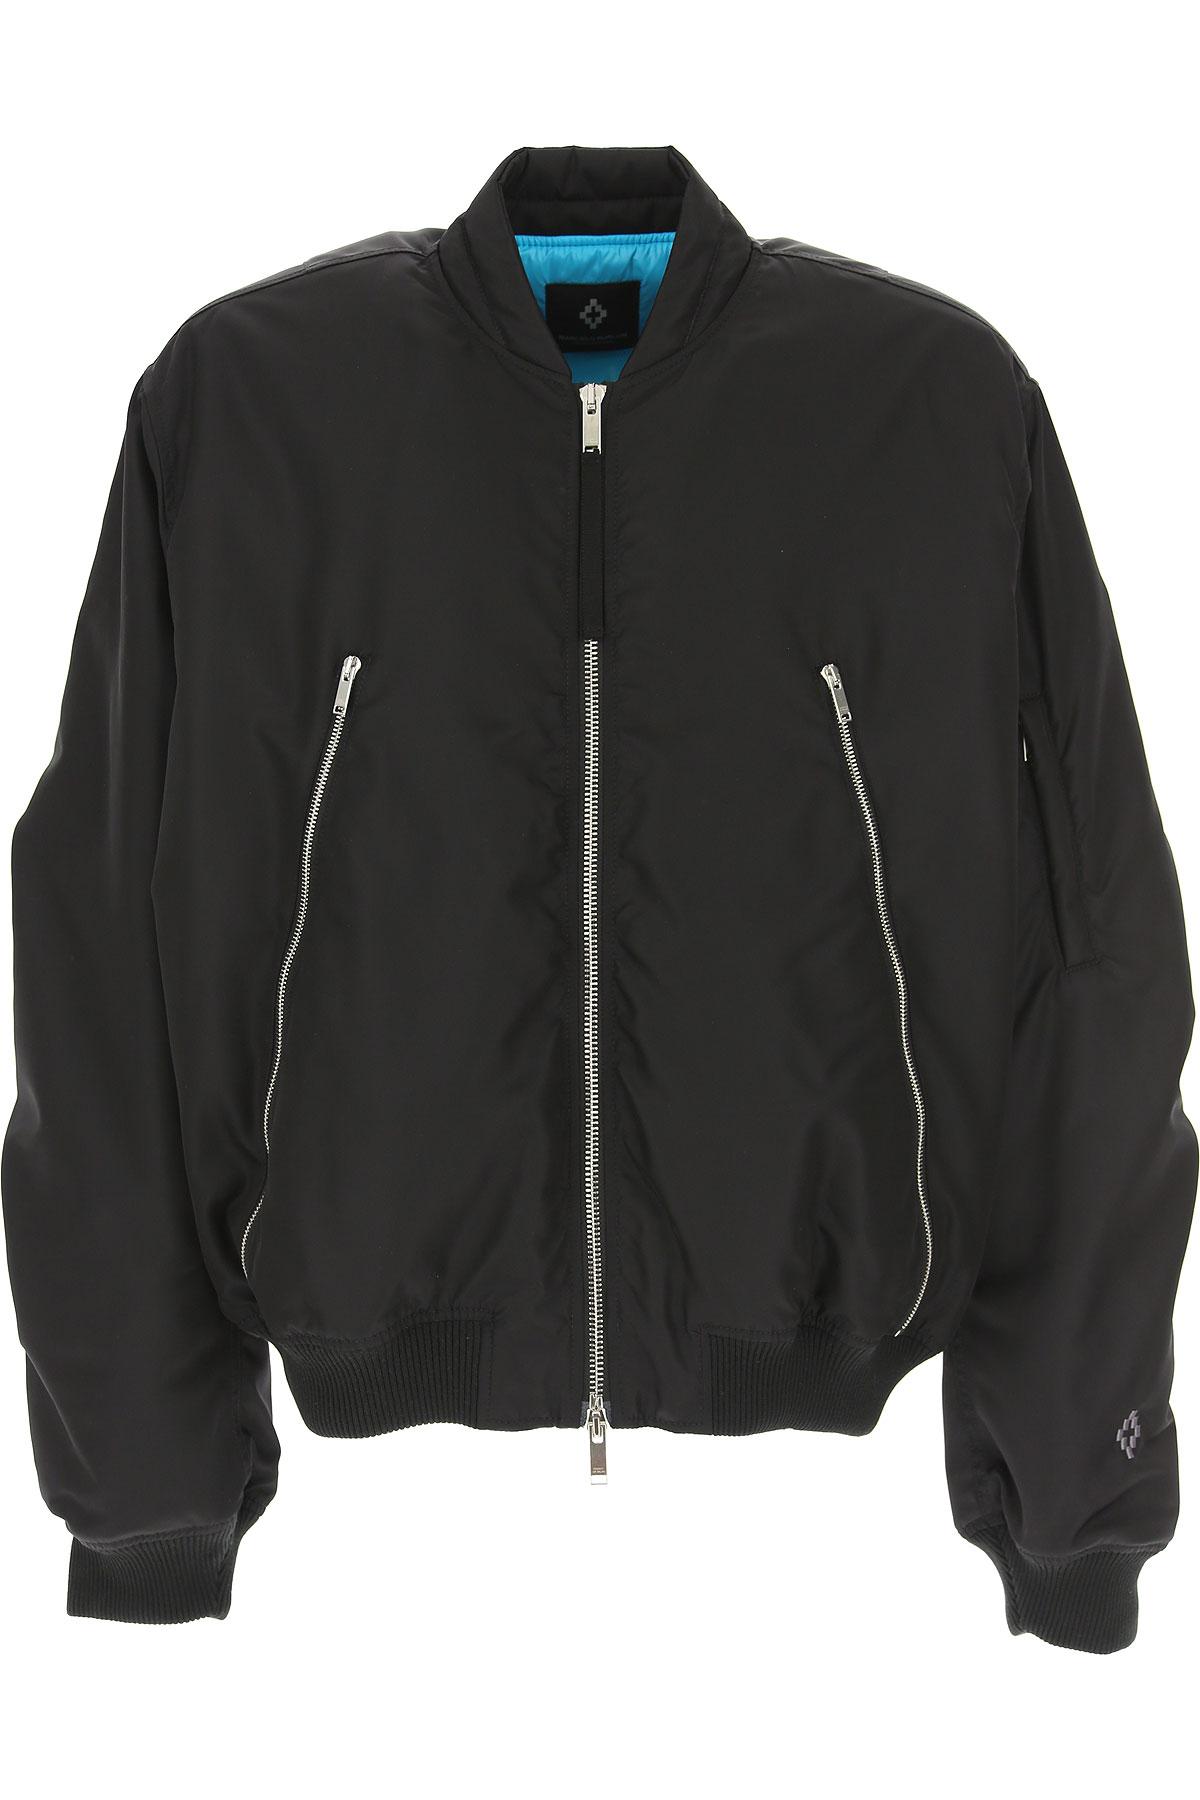 Marcelo Burlon Down Jacket for Men, Puffer Ski Jacket On Sale, Black, polyestere, 2019, L M S